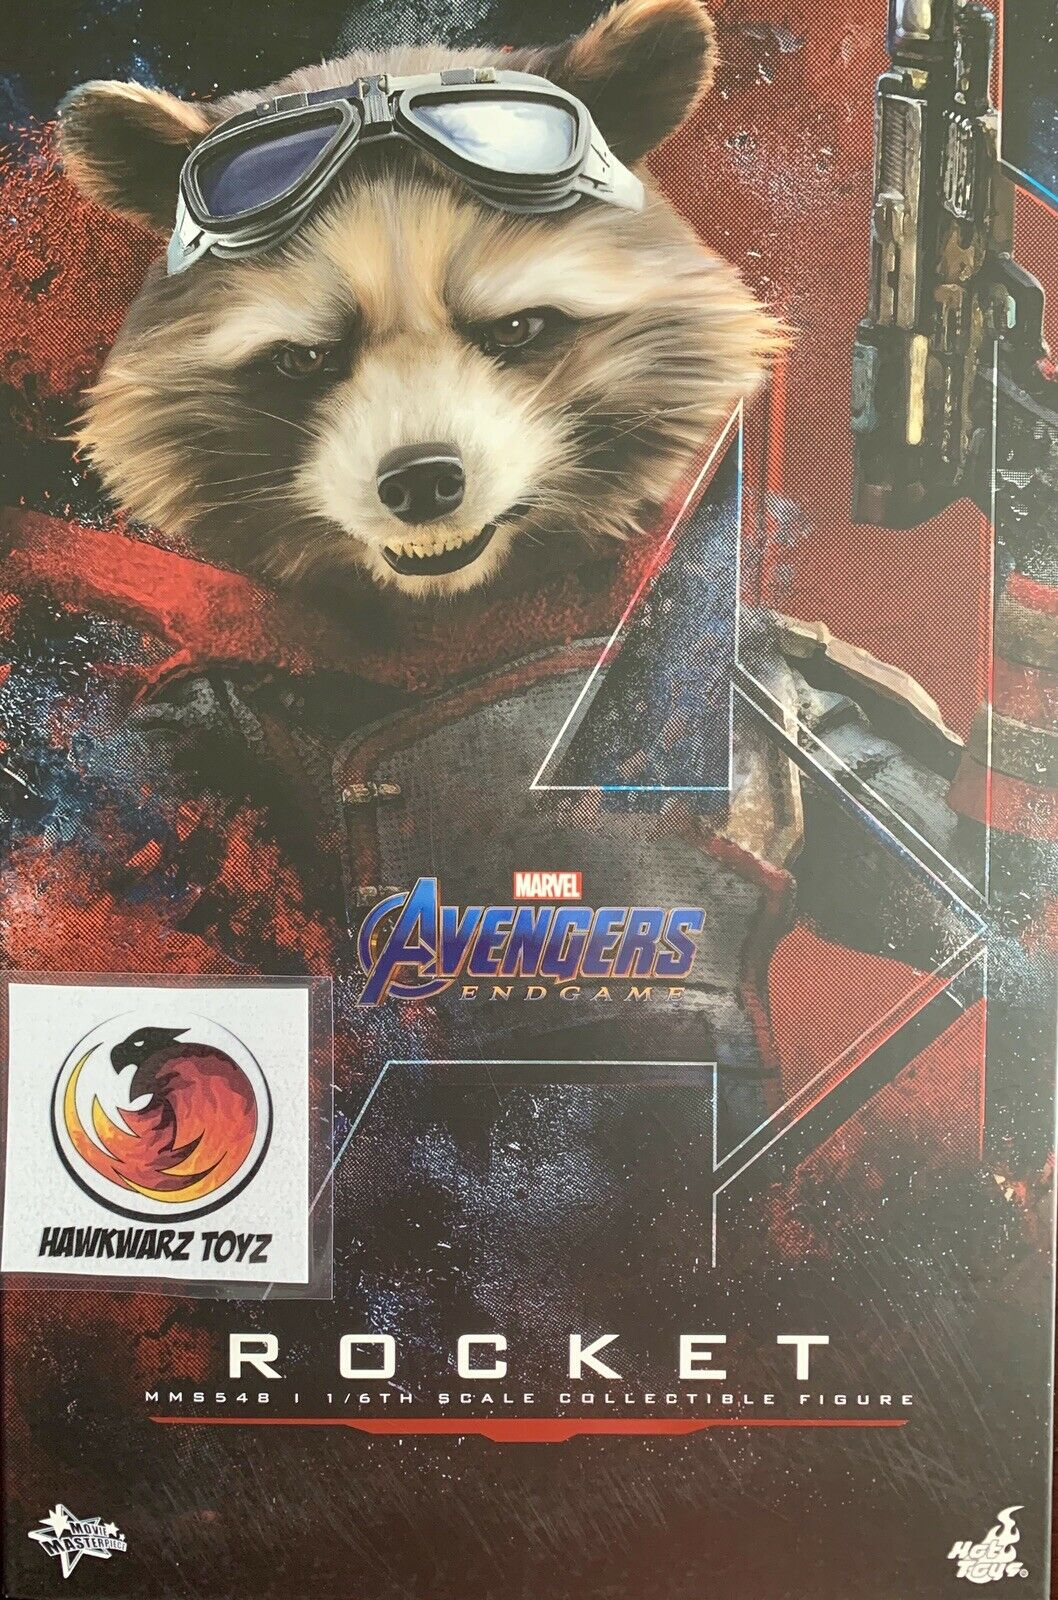 Hot Toys Marvel Avengers End Game Rocket Raccoon MMS548 1/6 Sideshow Disney on eBay thumbnail